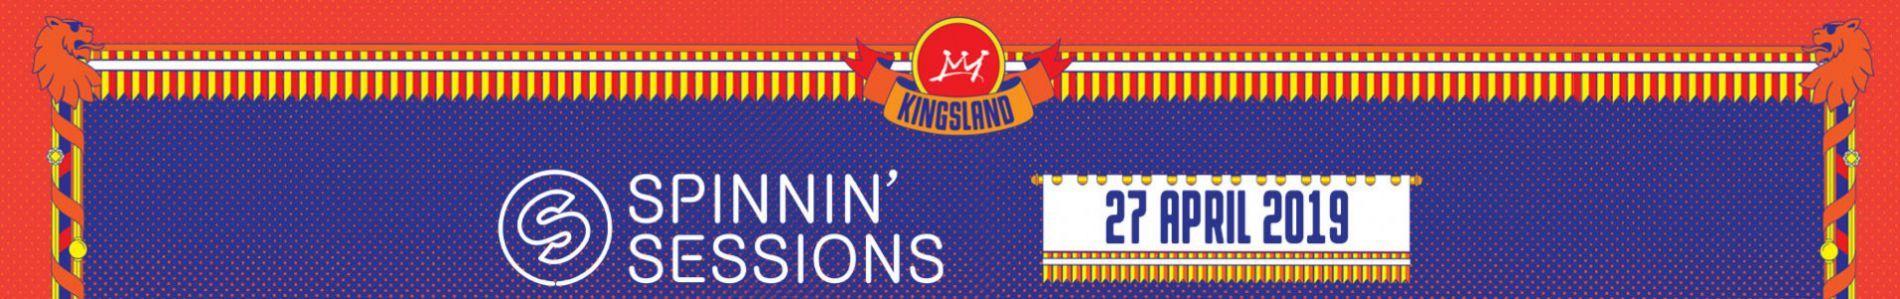 Spinnin' Sessions Spinnin' Sessions | Kingsland 2019